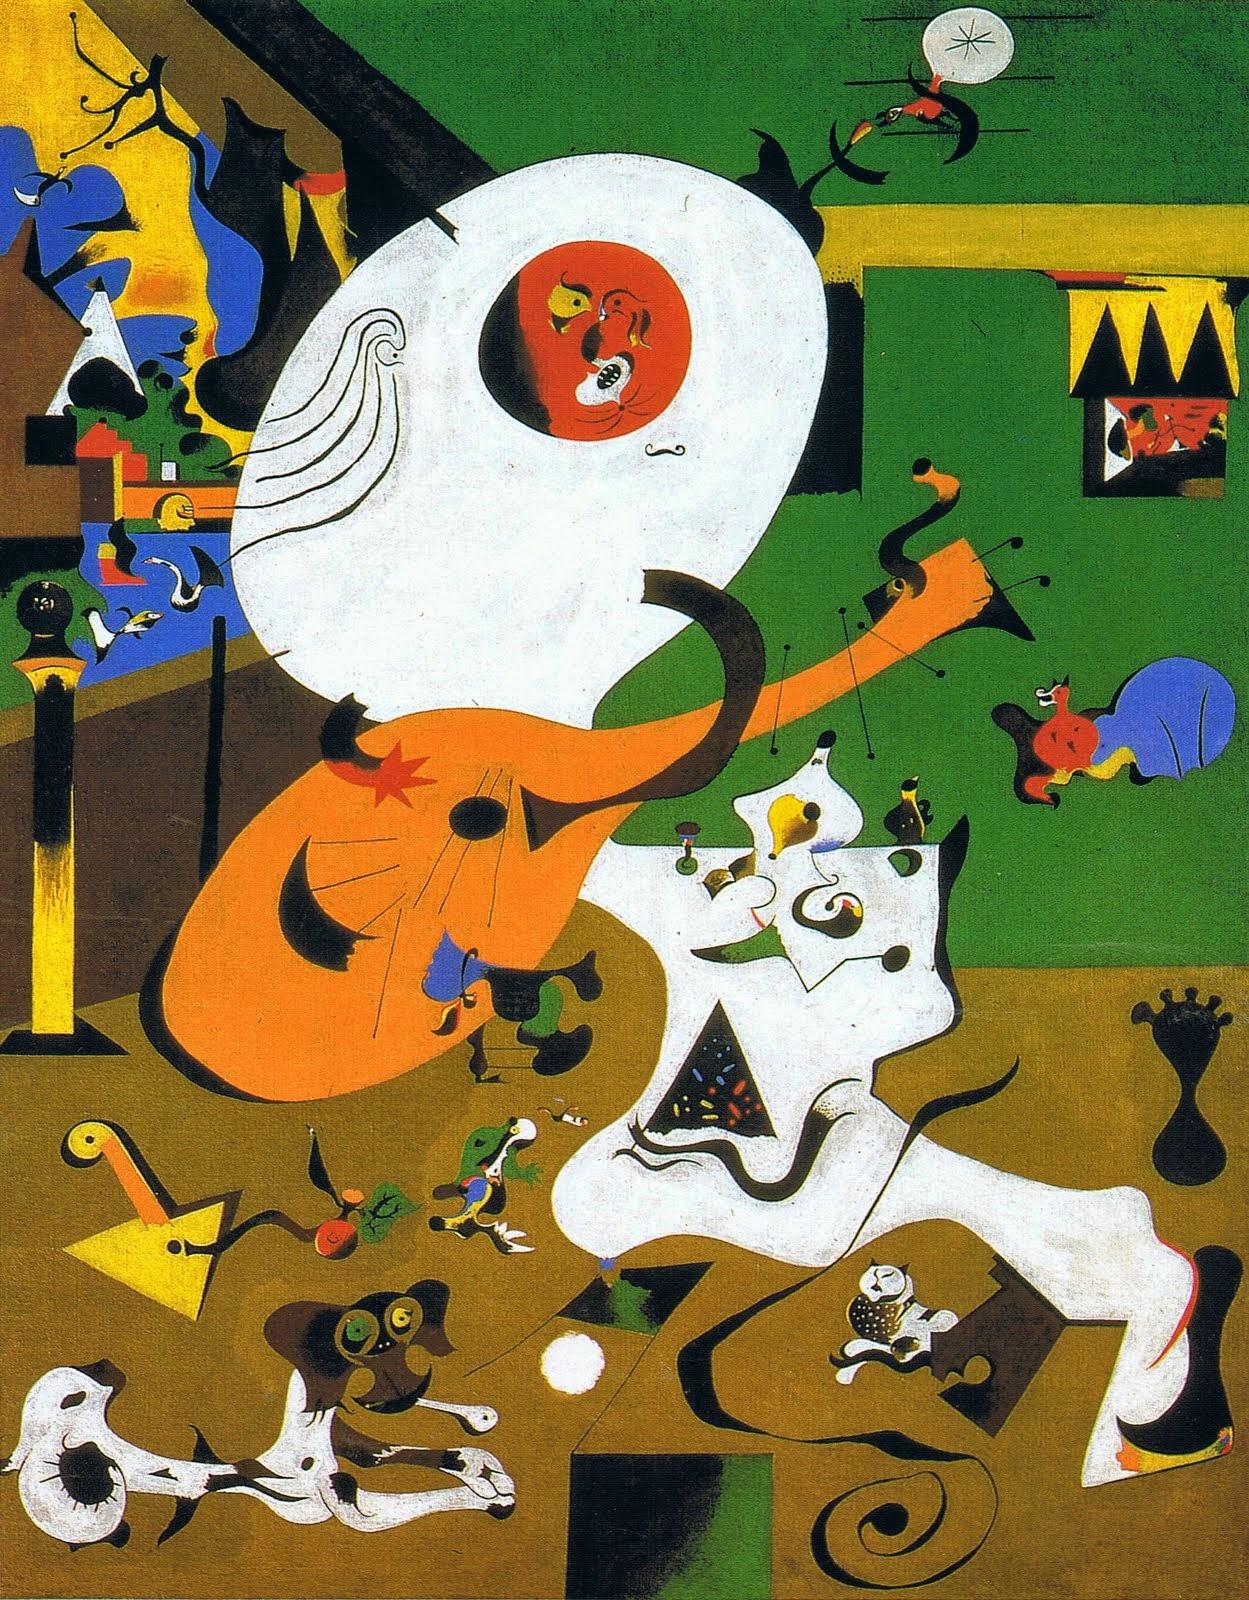 Interior Holandês l - Miró, Joan e suas principais pinturas